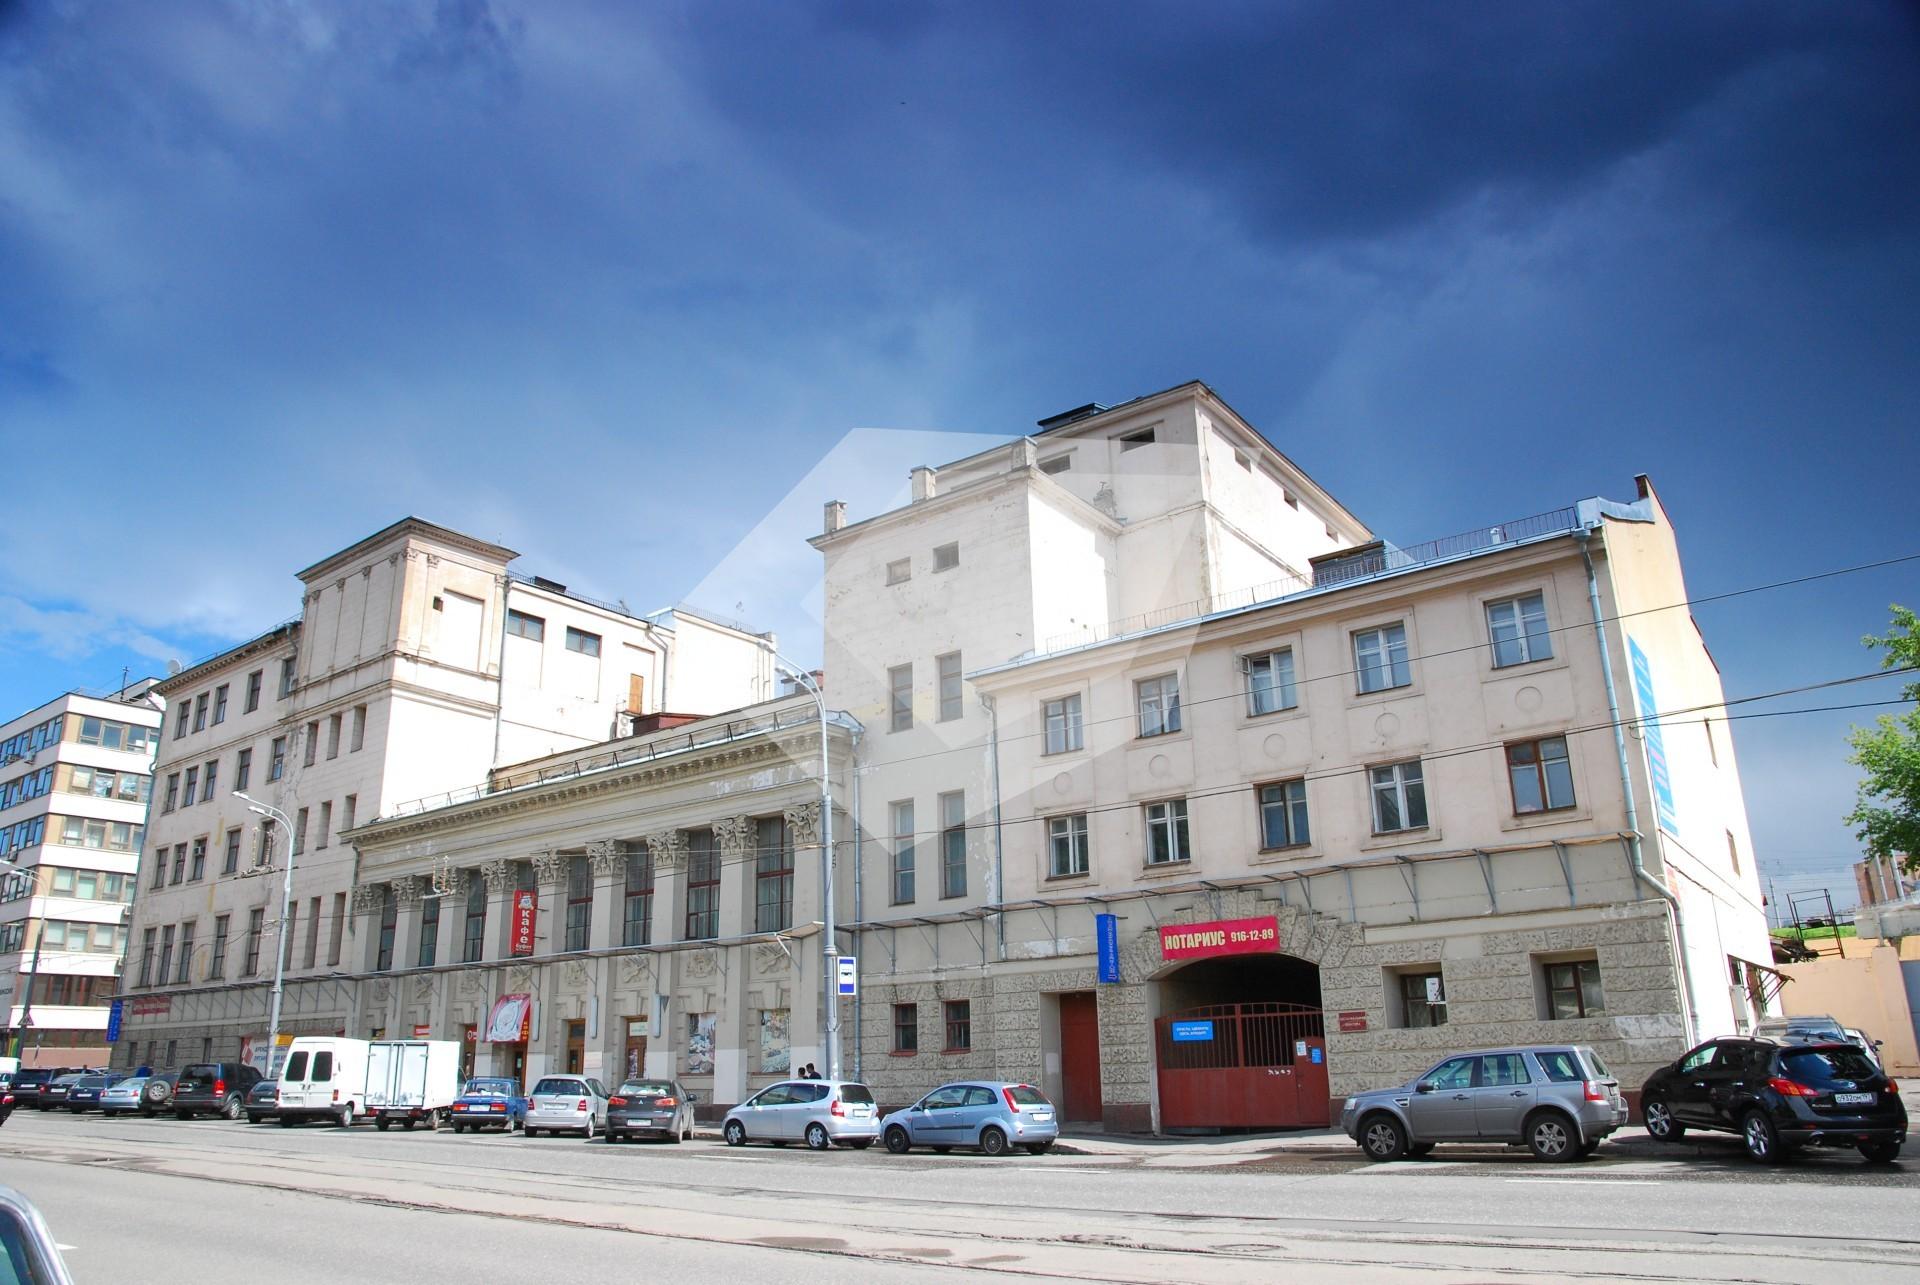 Аренда офиса костомаровский переулок фабрика аренда офиса на улице кедрова